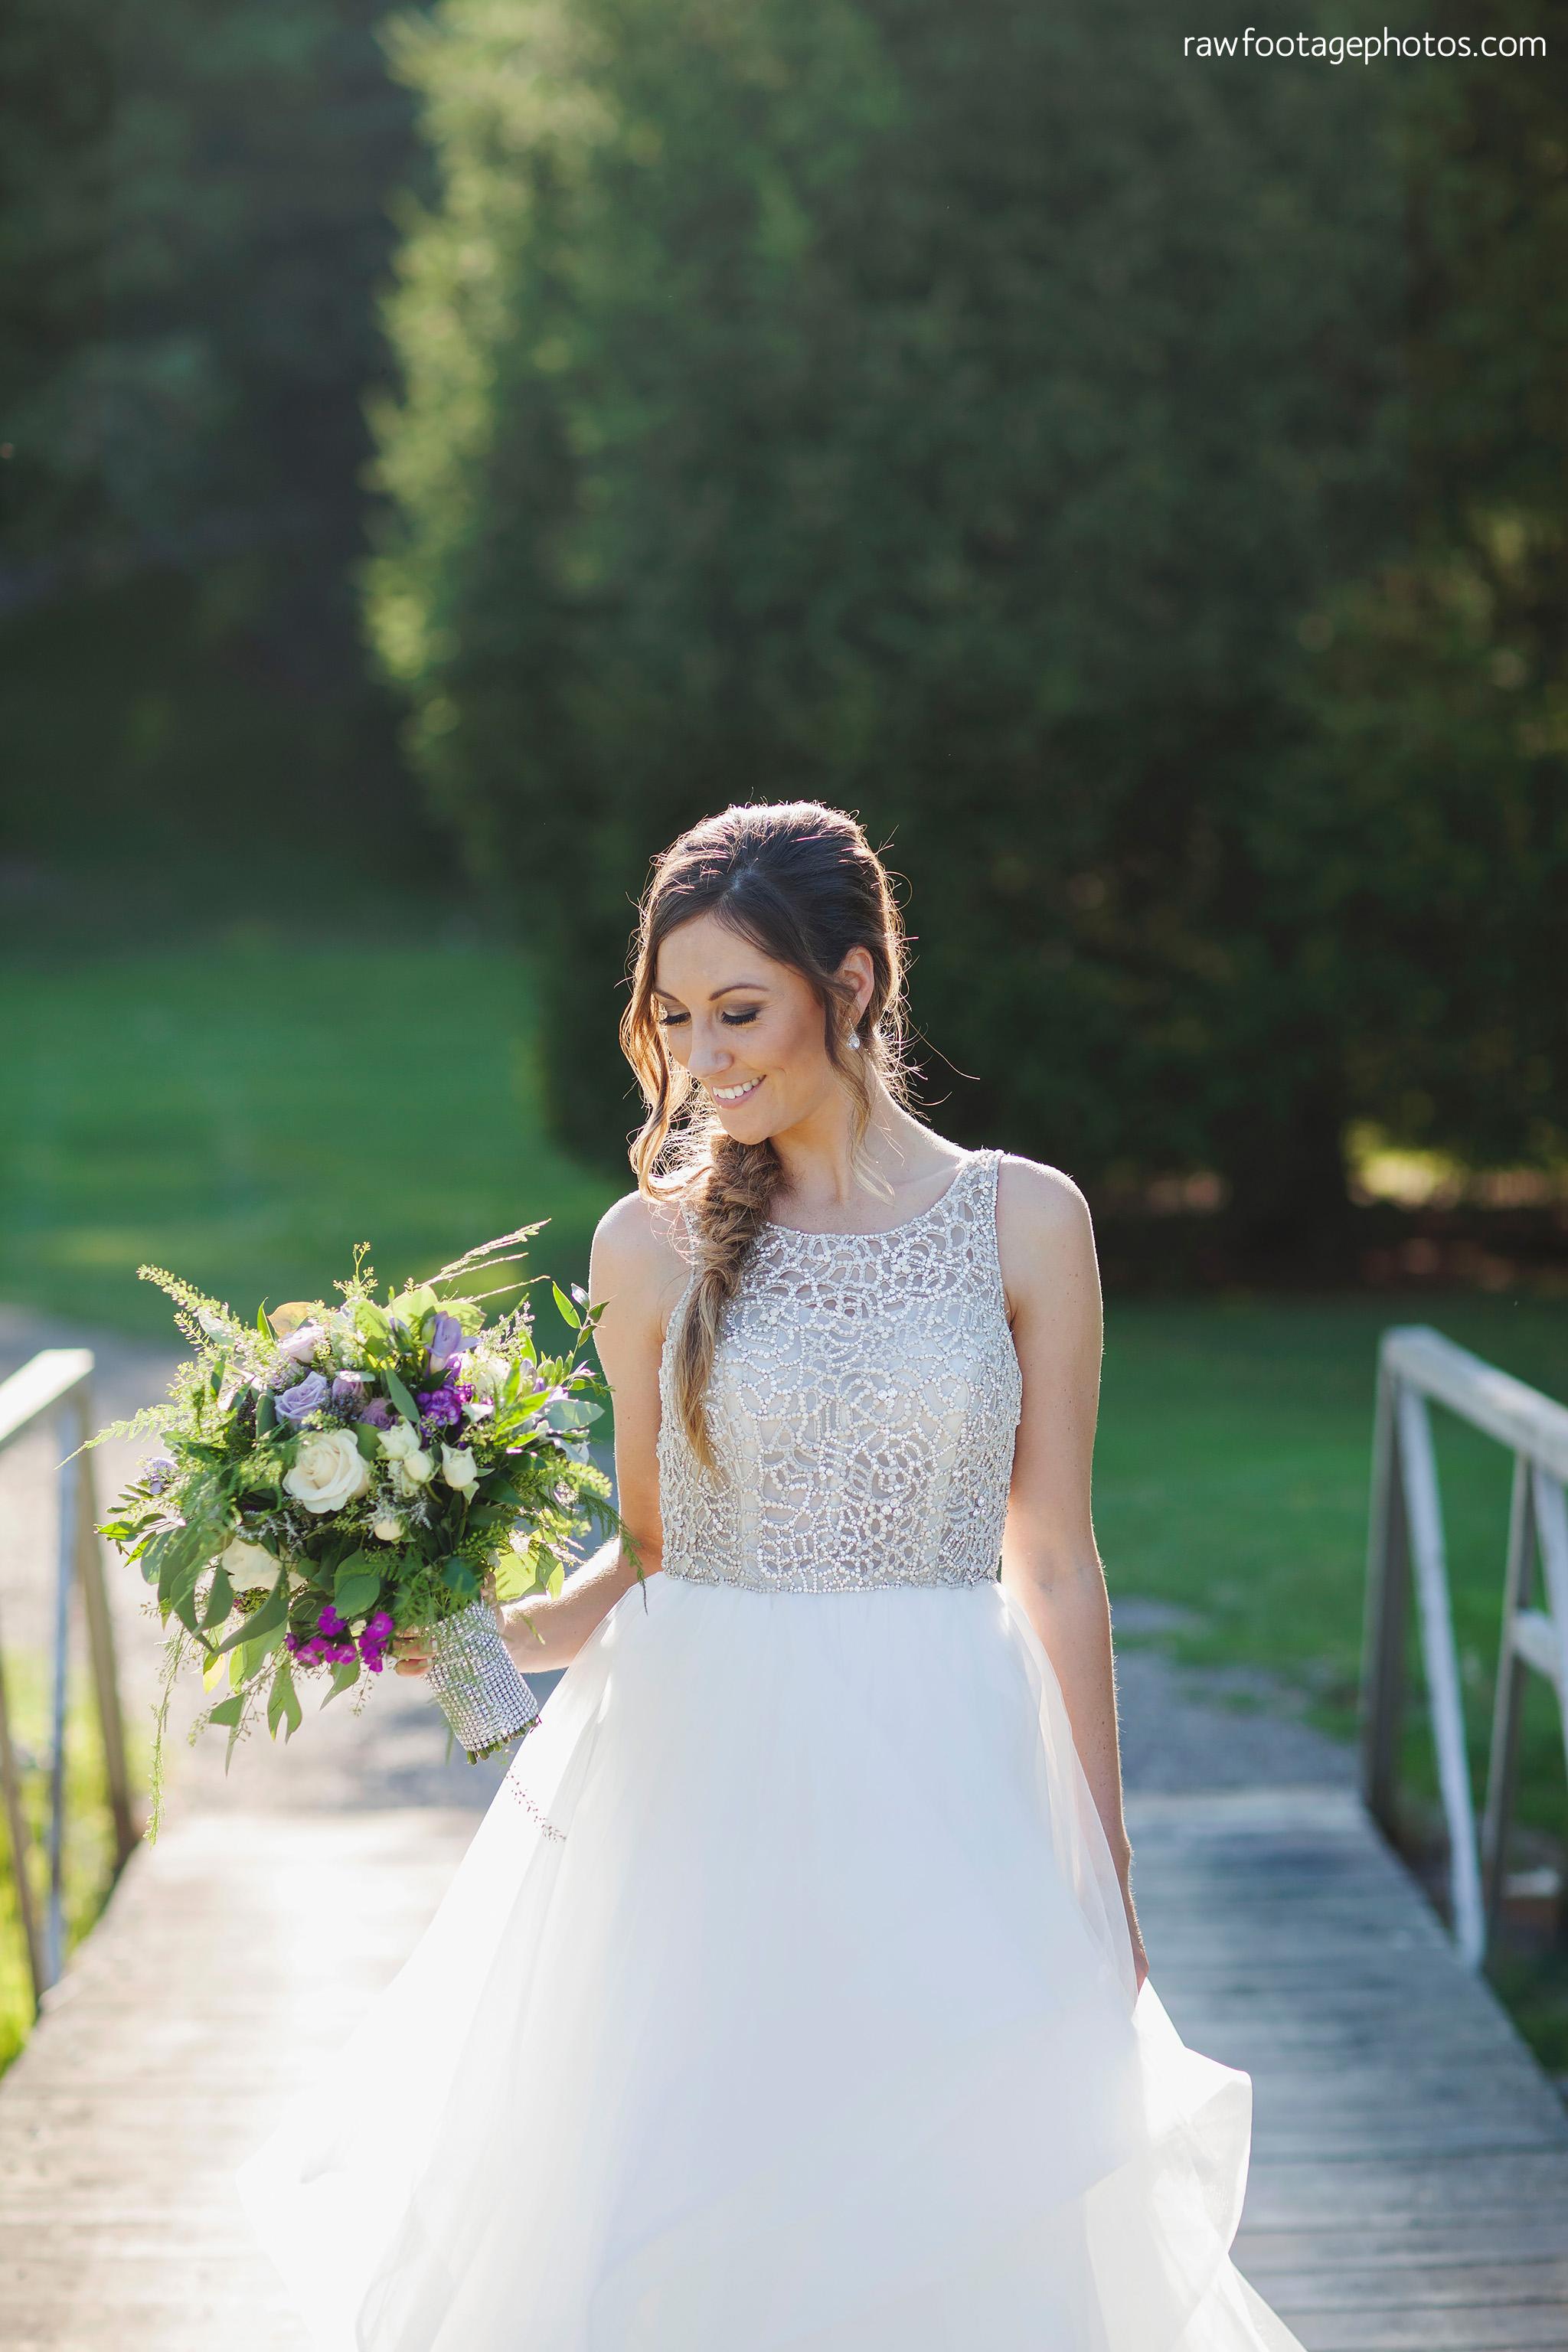 london_ontario_wedding_photographer-grand_bend_wedding_photographer-oakwood_resort_wedding-beach_wedding-sunset_wedding-raw_footage_photography052.jpg